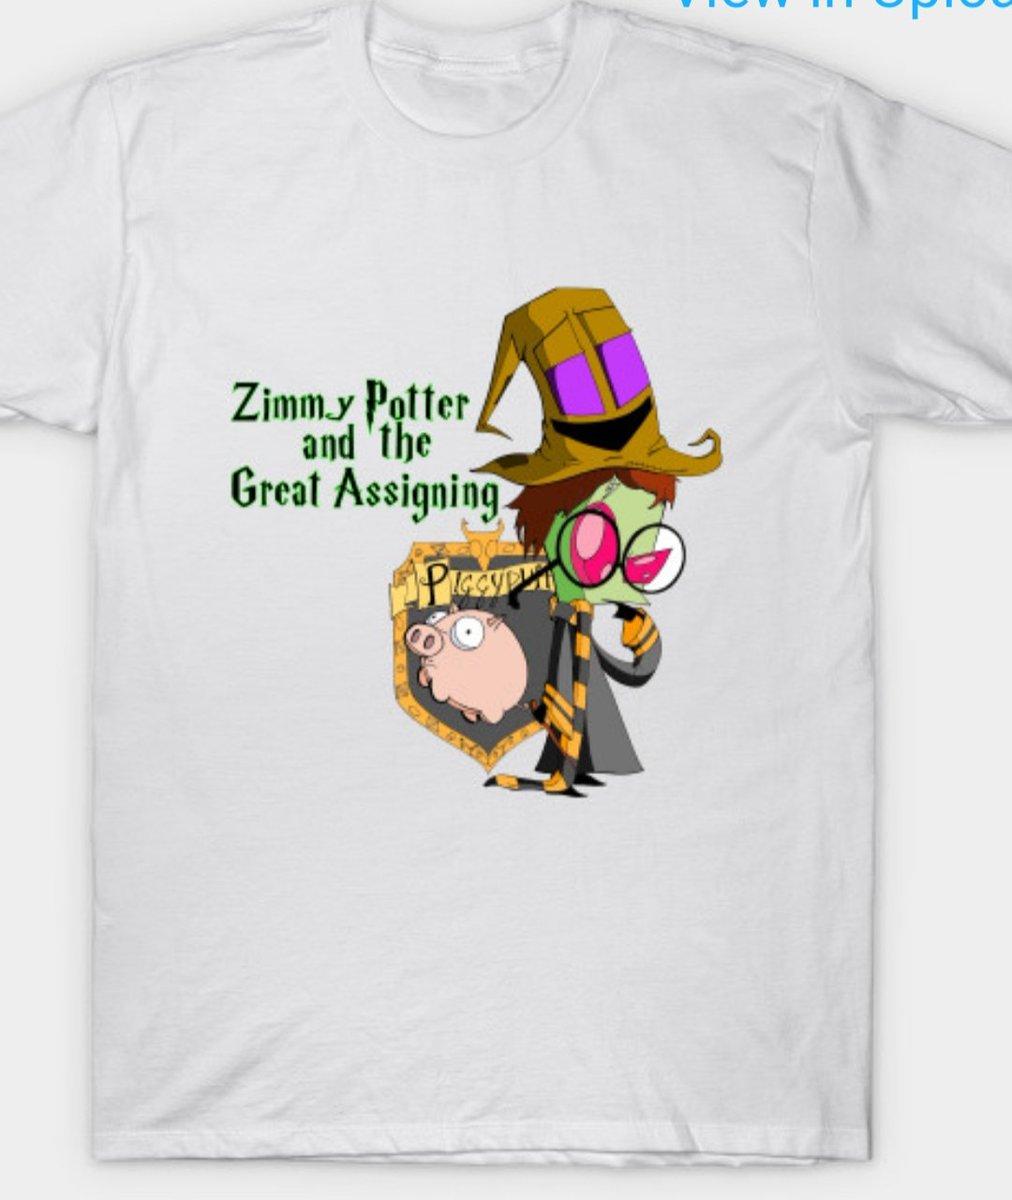 https://www.teepublic.com/user/ferrell #invaderzim #zim #gir #harrypotter #hogwarts #griffyndor #hufflepuff #ravenclaw #slytherin #cartoon #anime #cosplay #alien #robot #witch #art #artist #ArtistOnTwitter #starvingartist #draw #drawing #illustration #sketch #sketchbook #design #doodle #fanartpic.twitter.com/1VMlcgyI6Y